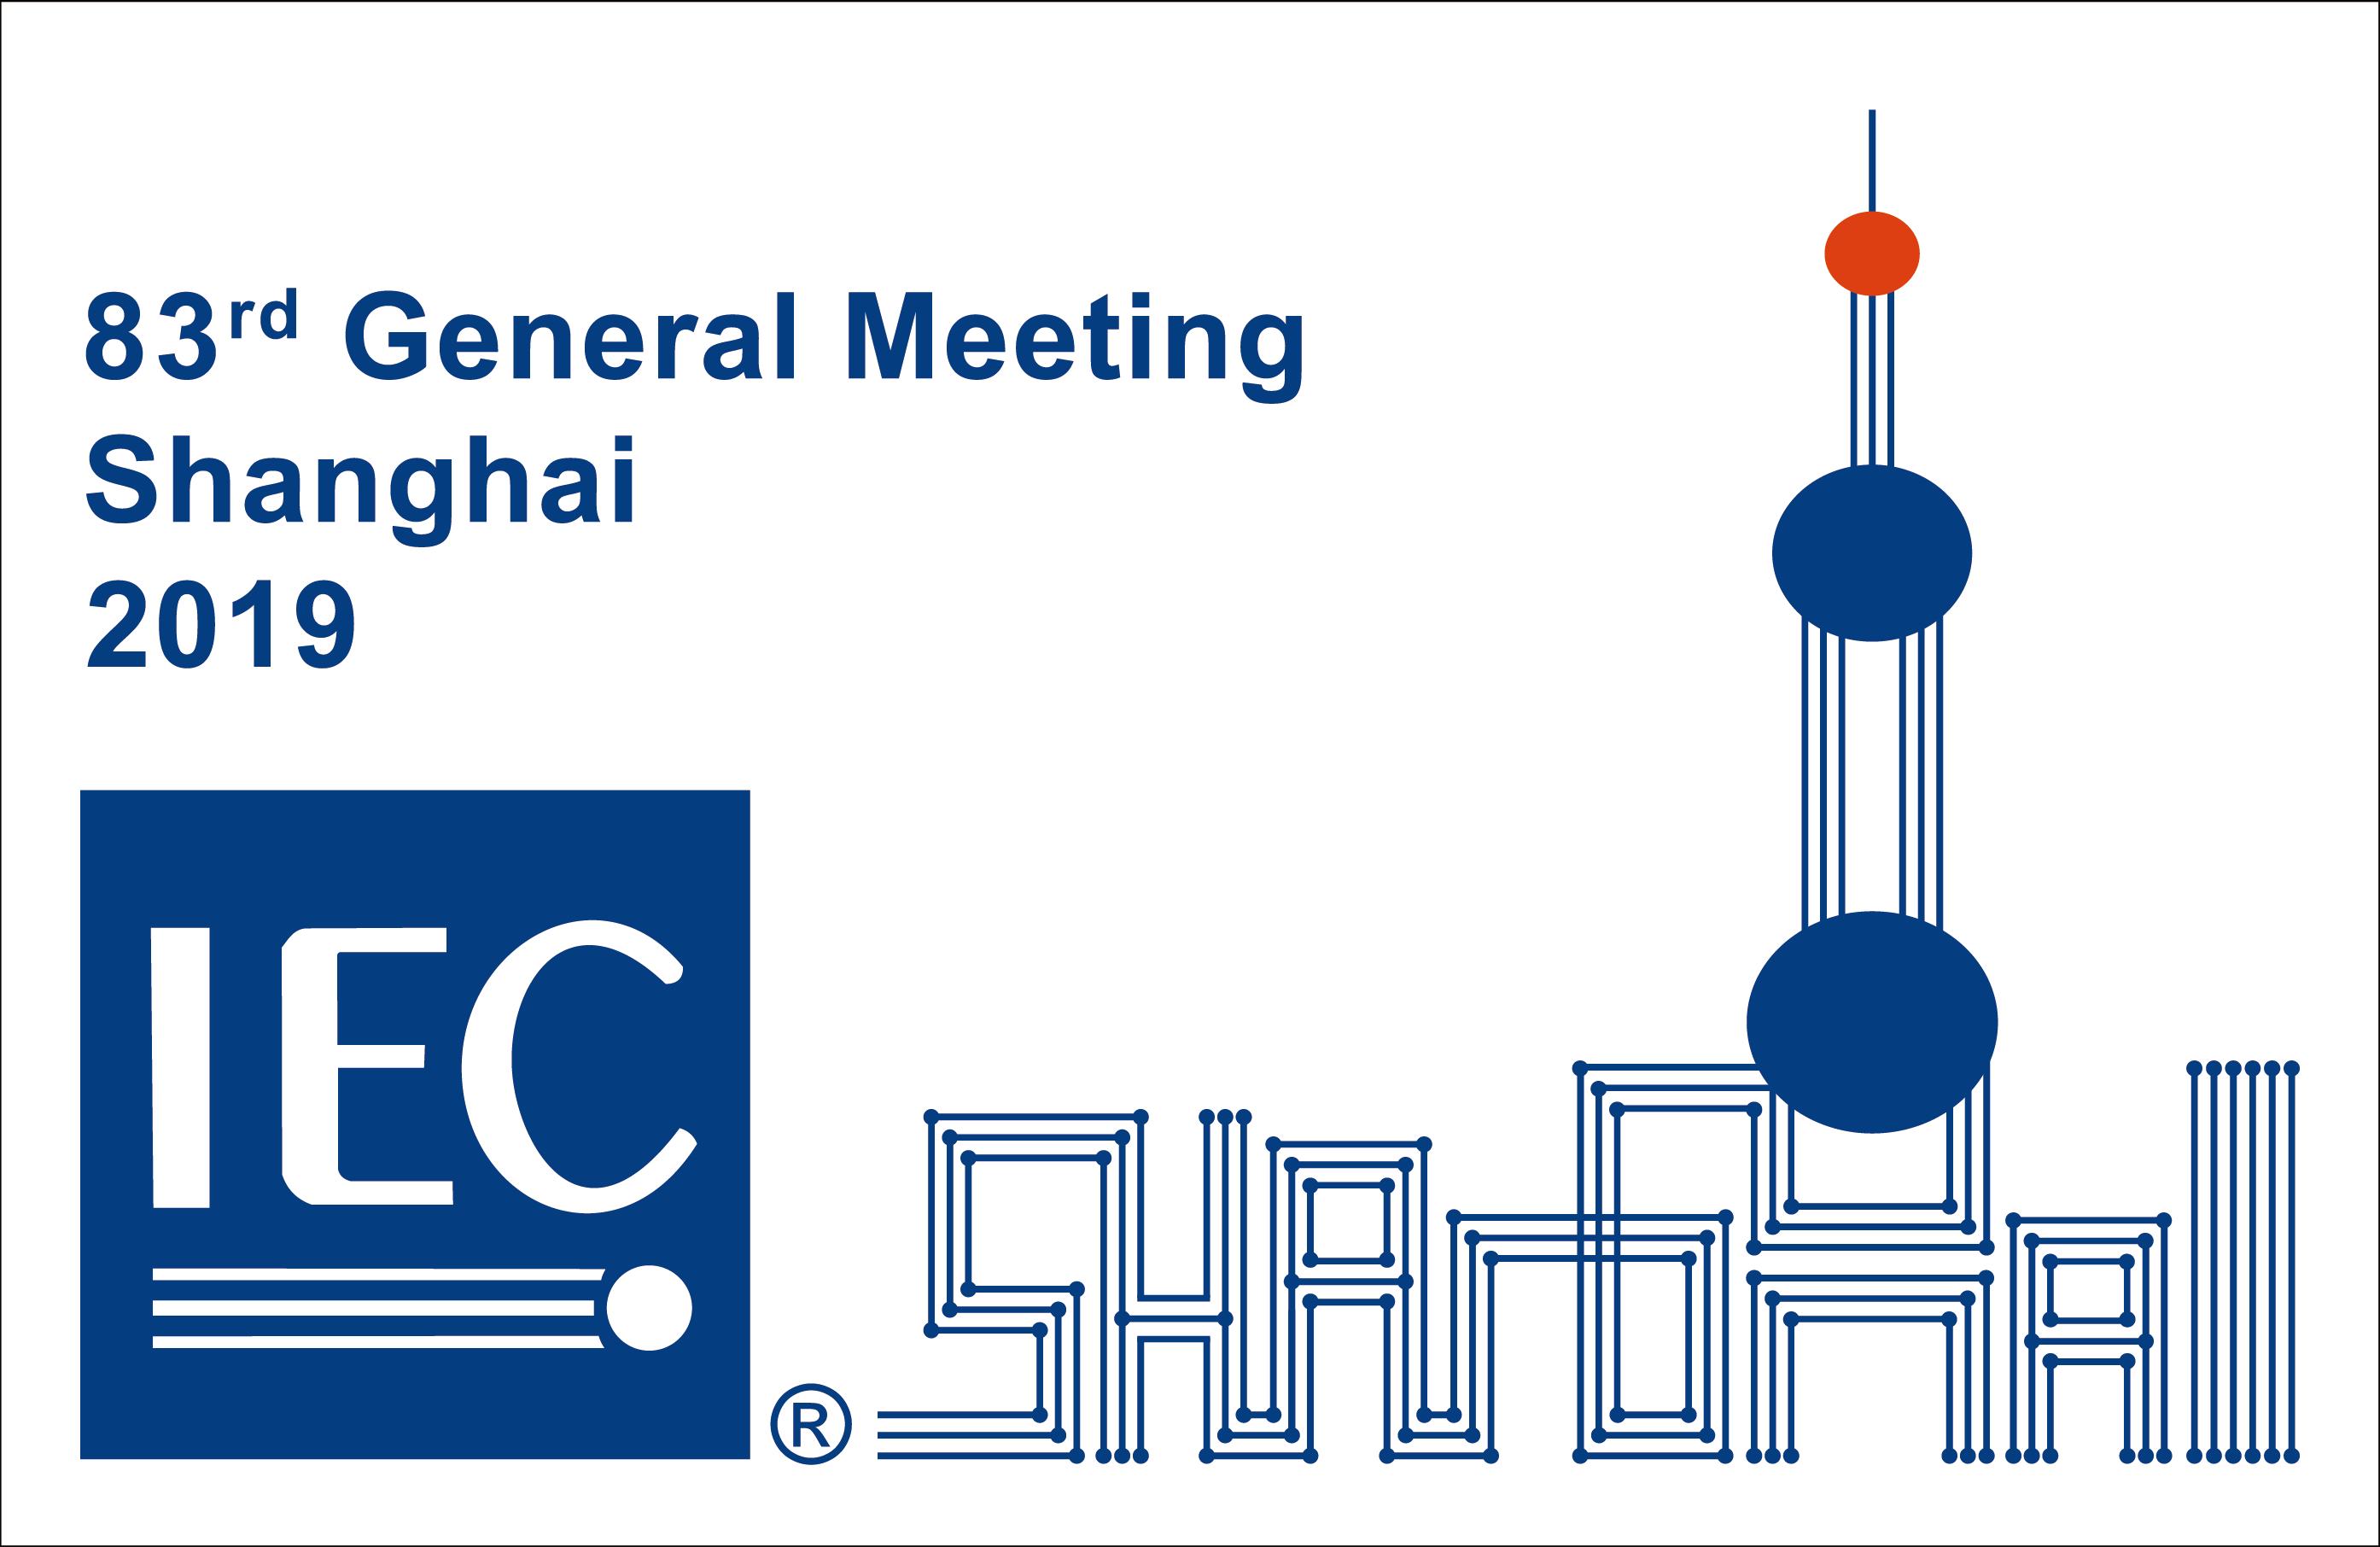 IEC General Meeting 2019